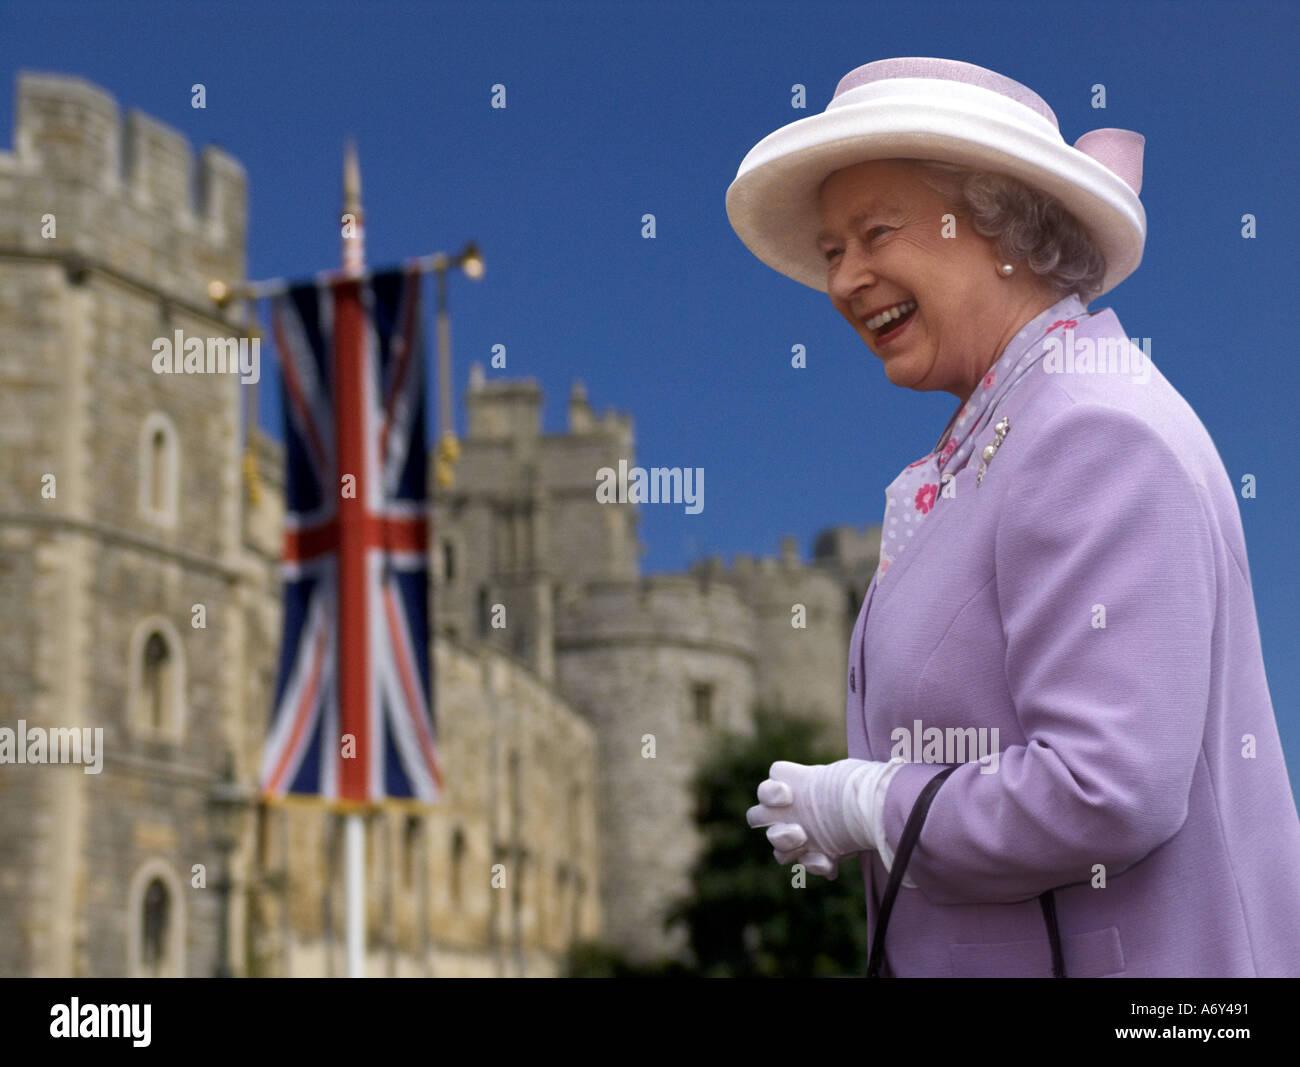 QUEEN ELIZABETH II Windsor Castle happy smiling HRH Queen Elizabeth 2nd in grounds of Windsor Castle Union Jack  flag in background England UK - Stock Image